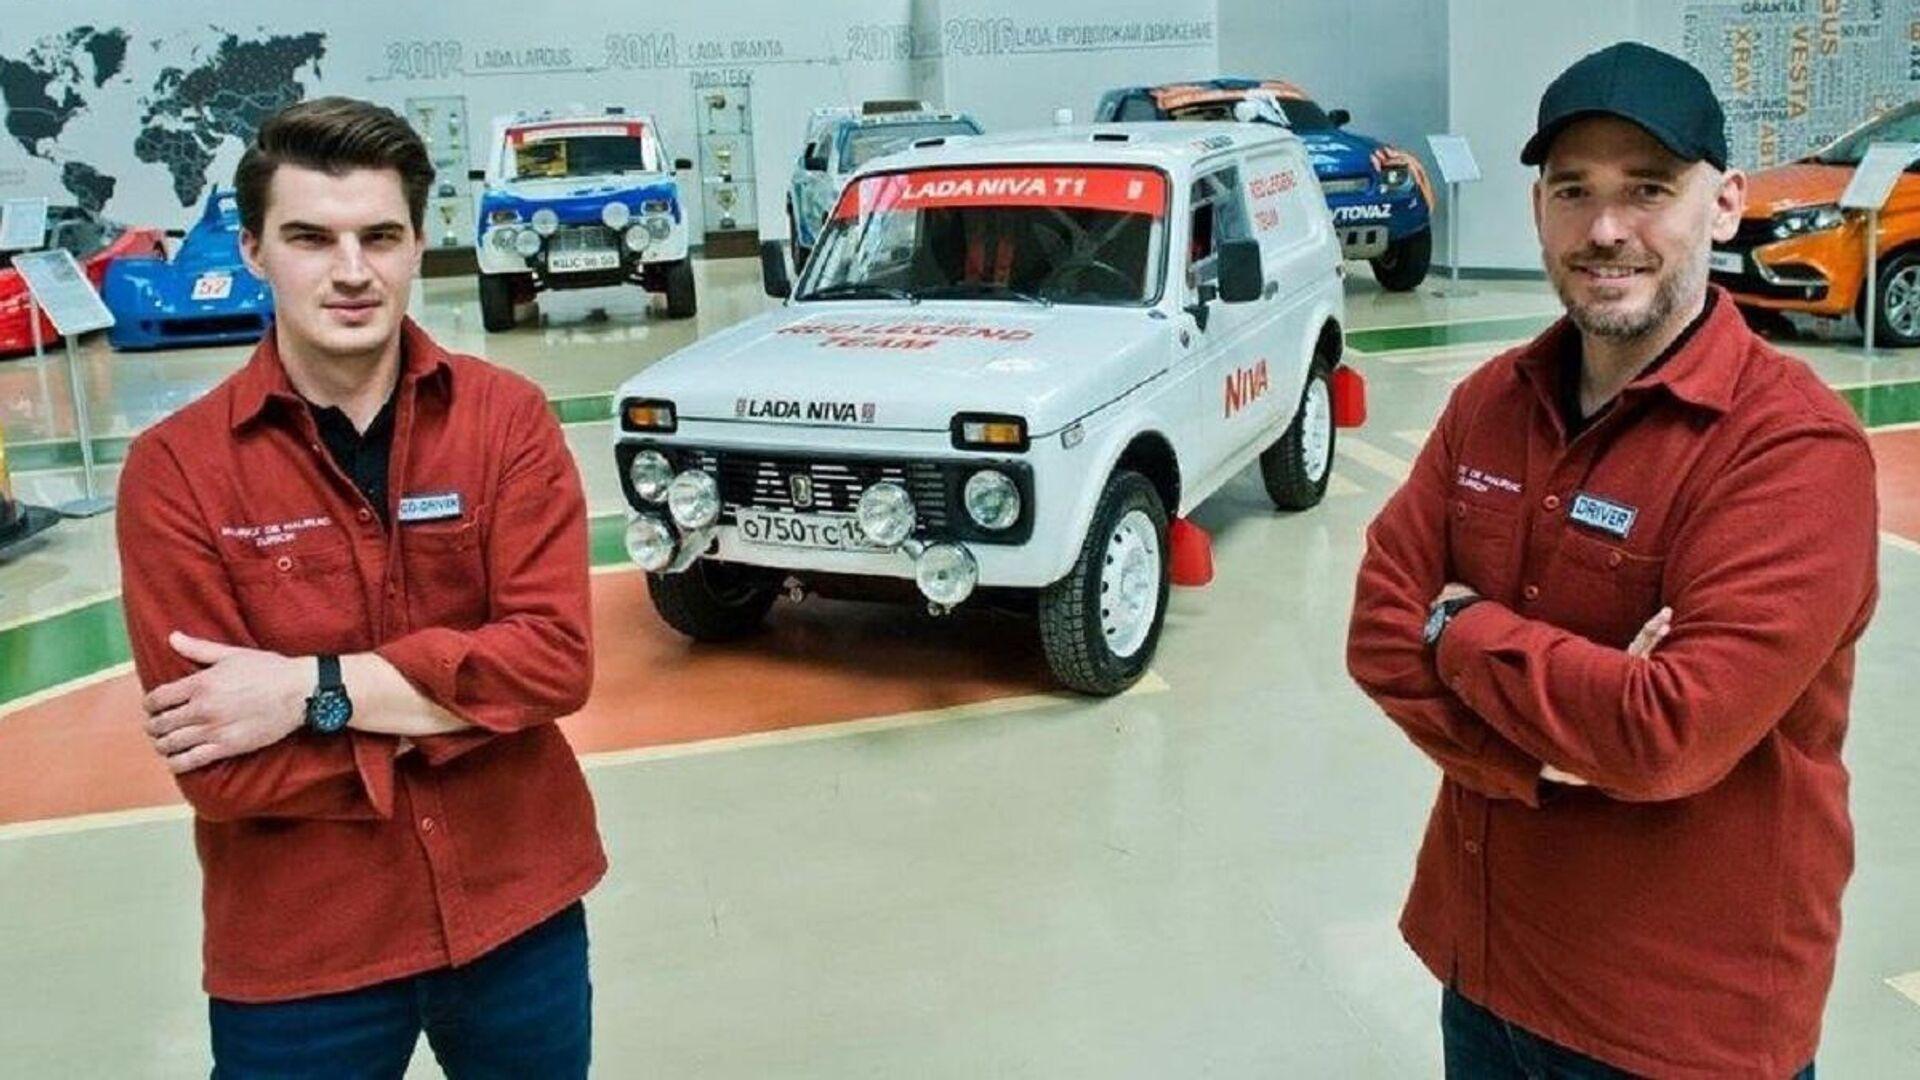 El Niva Red Legend Team modificado para el Rally Dakar 2022 - Sputnik Mundo, 1920, 24.09.2021